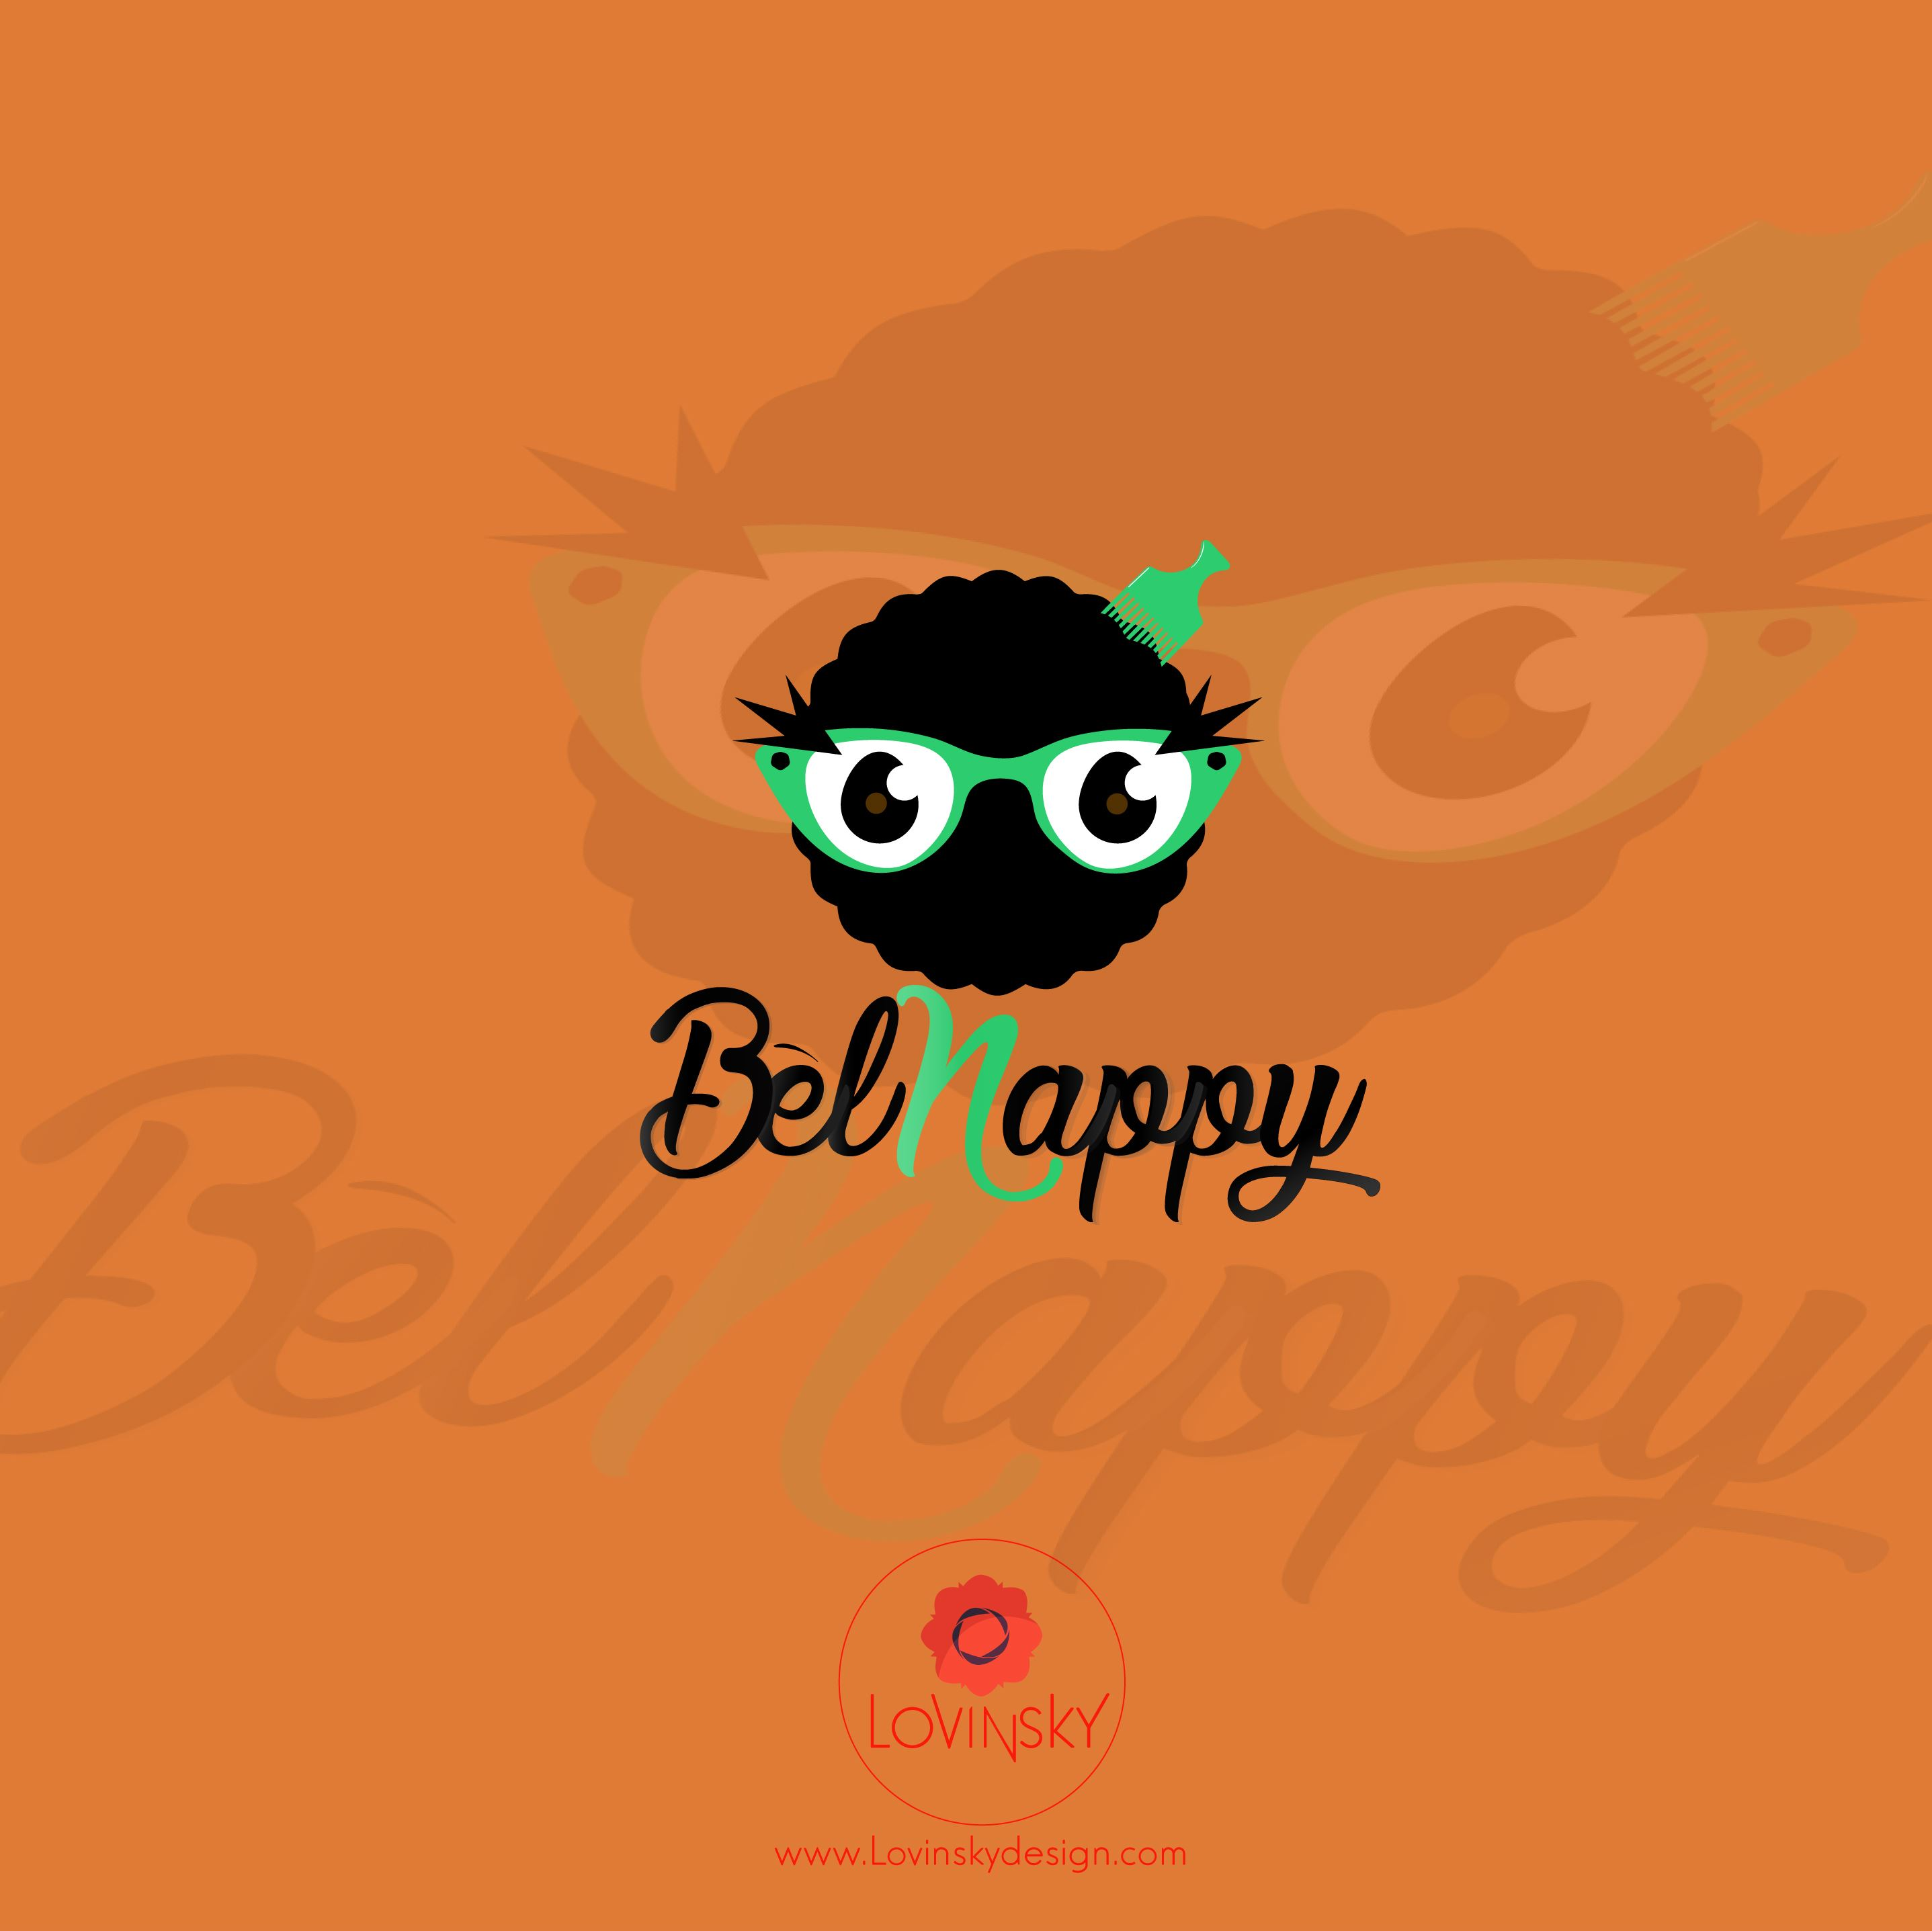 bel-nappy logo lovinsky graphiste webdesigner freelance nantes 44